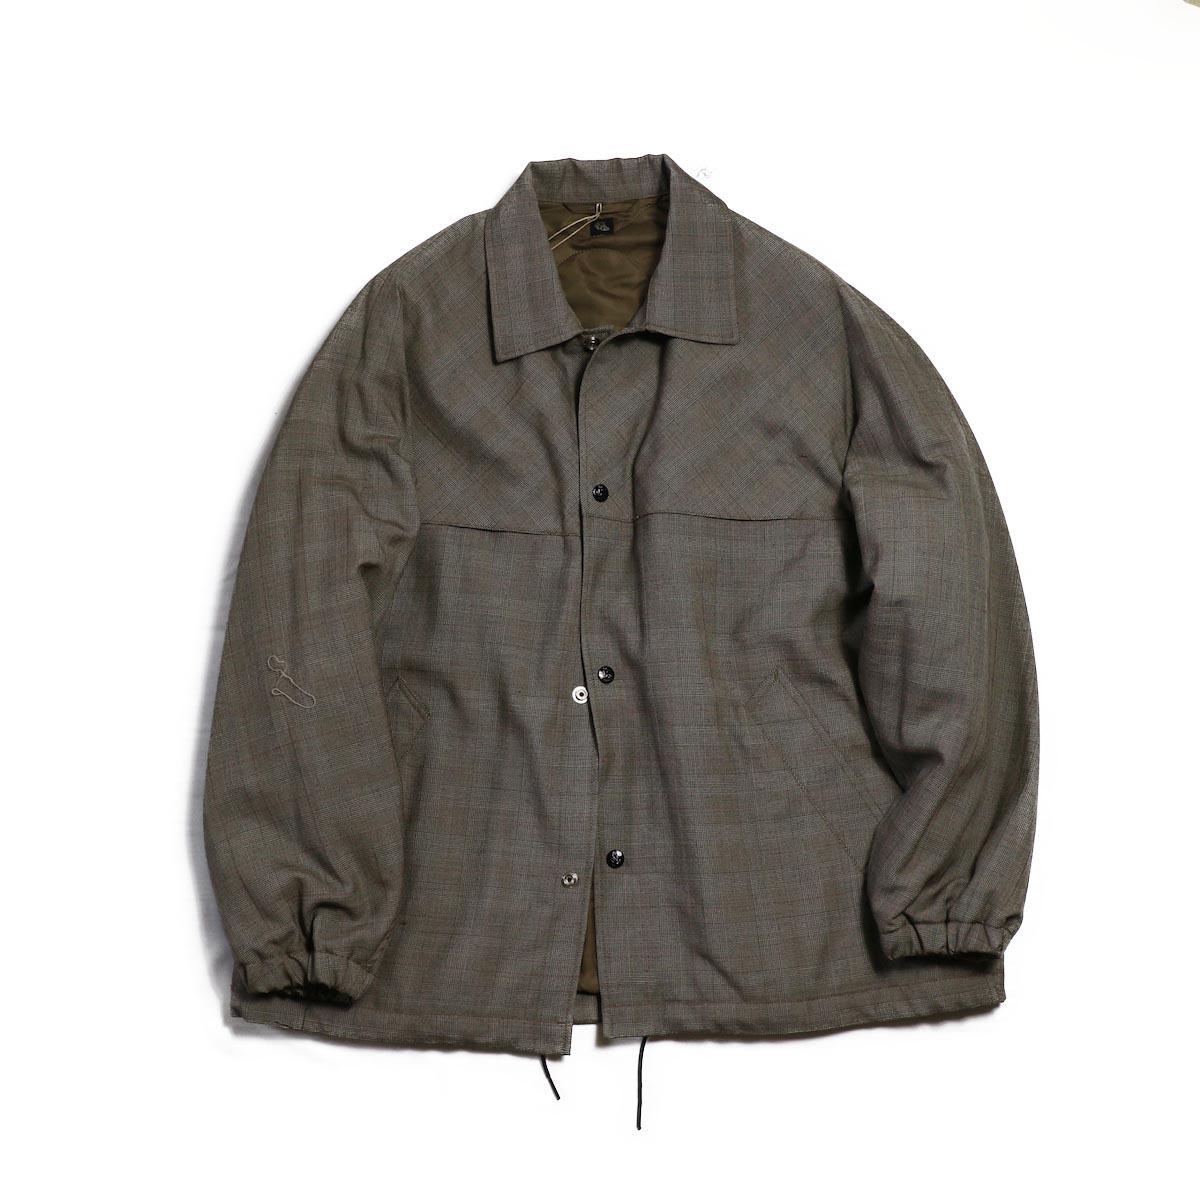 Kaptain Sunshine / Coatch Jacket -Brown Glen Plaid